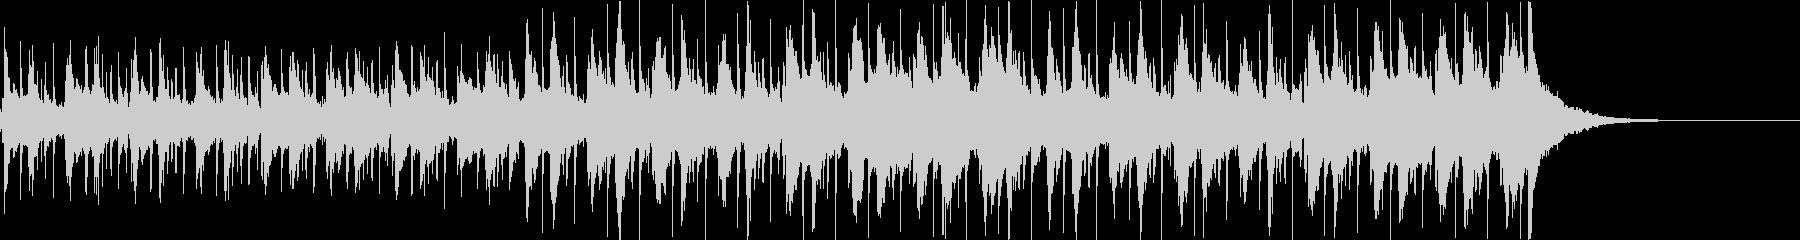 Pf「心象」生楽器音源打込Inst和風現の未再生の波形